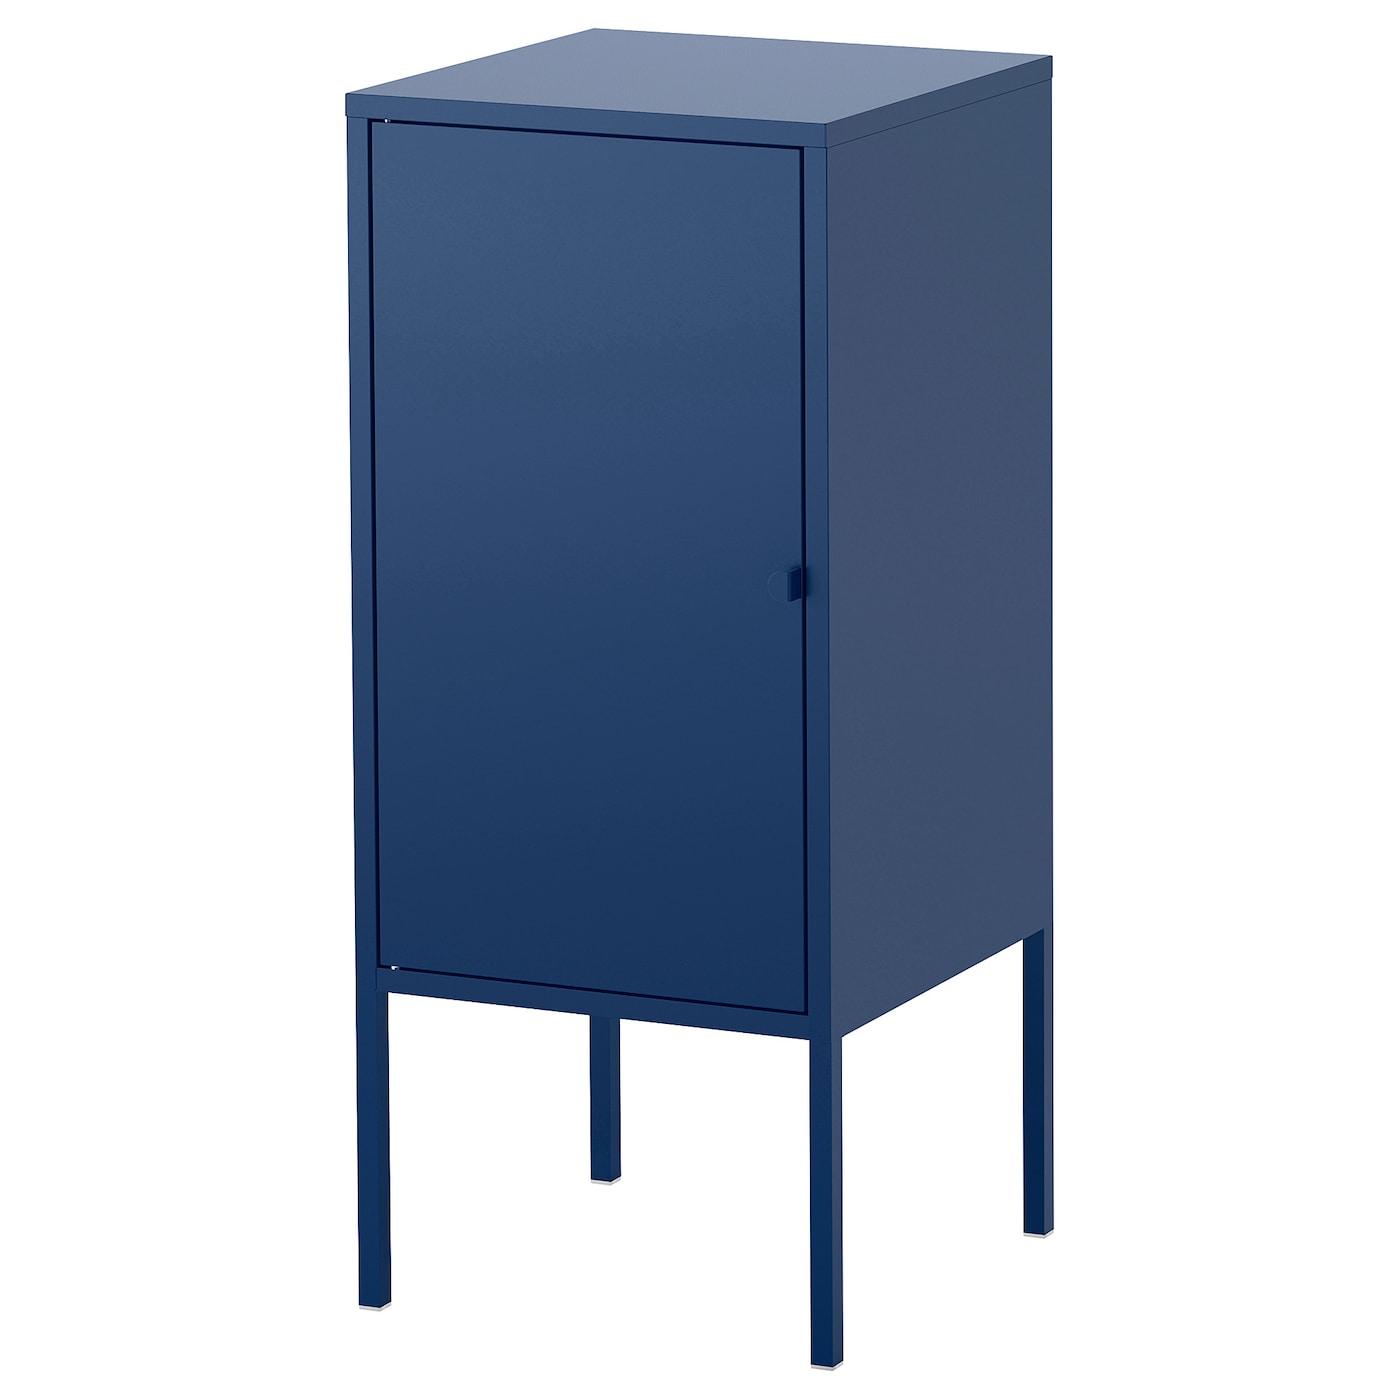 storage cabinets storage cupboards ikea ireland. Black Bedroom Furniture Sets. Home Design Ideas